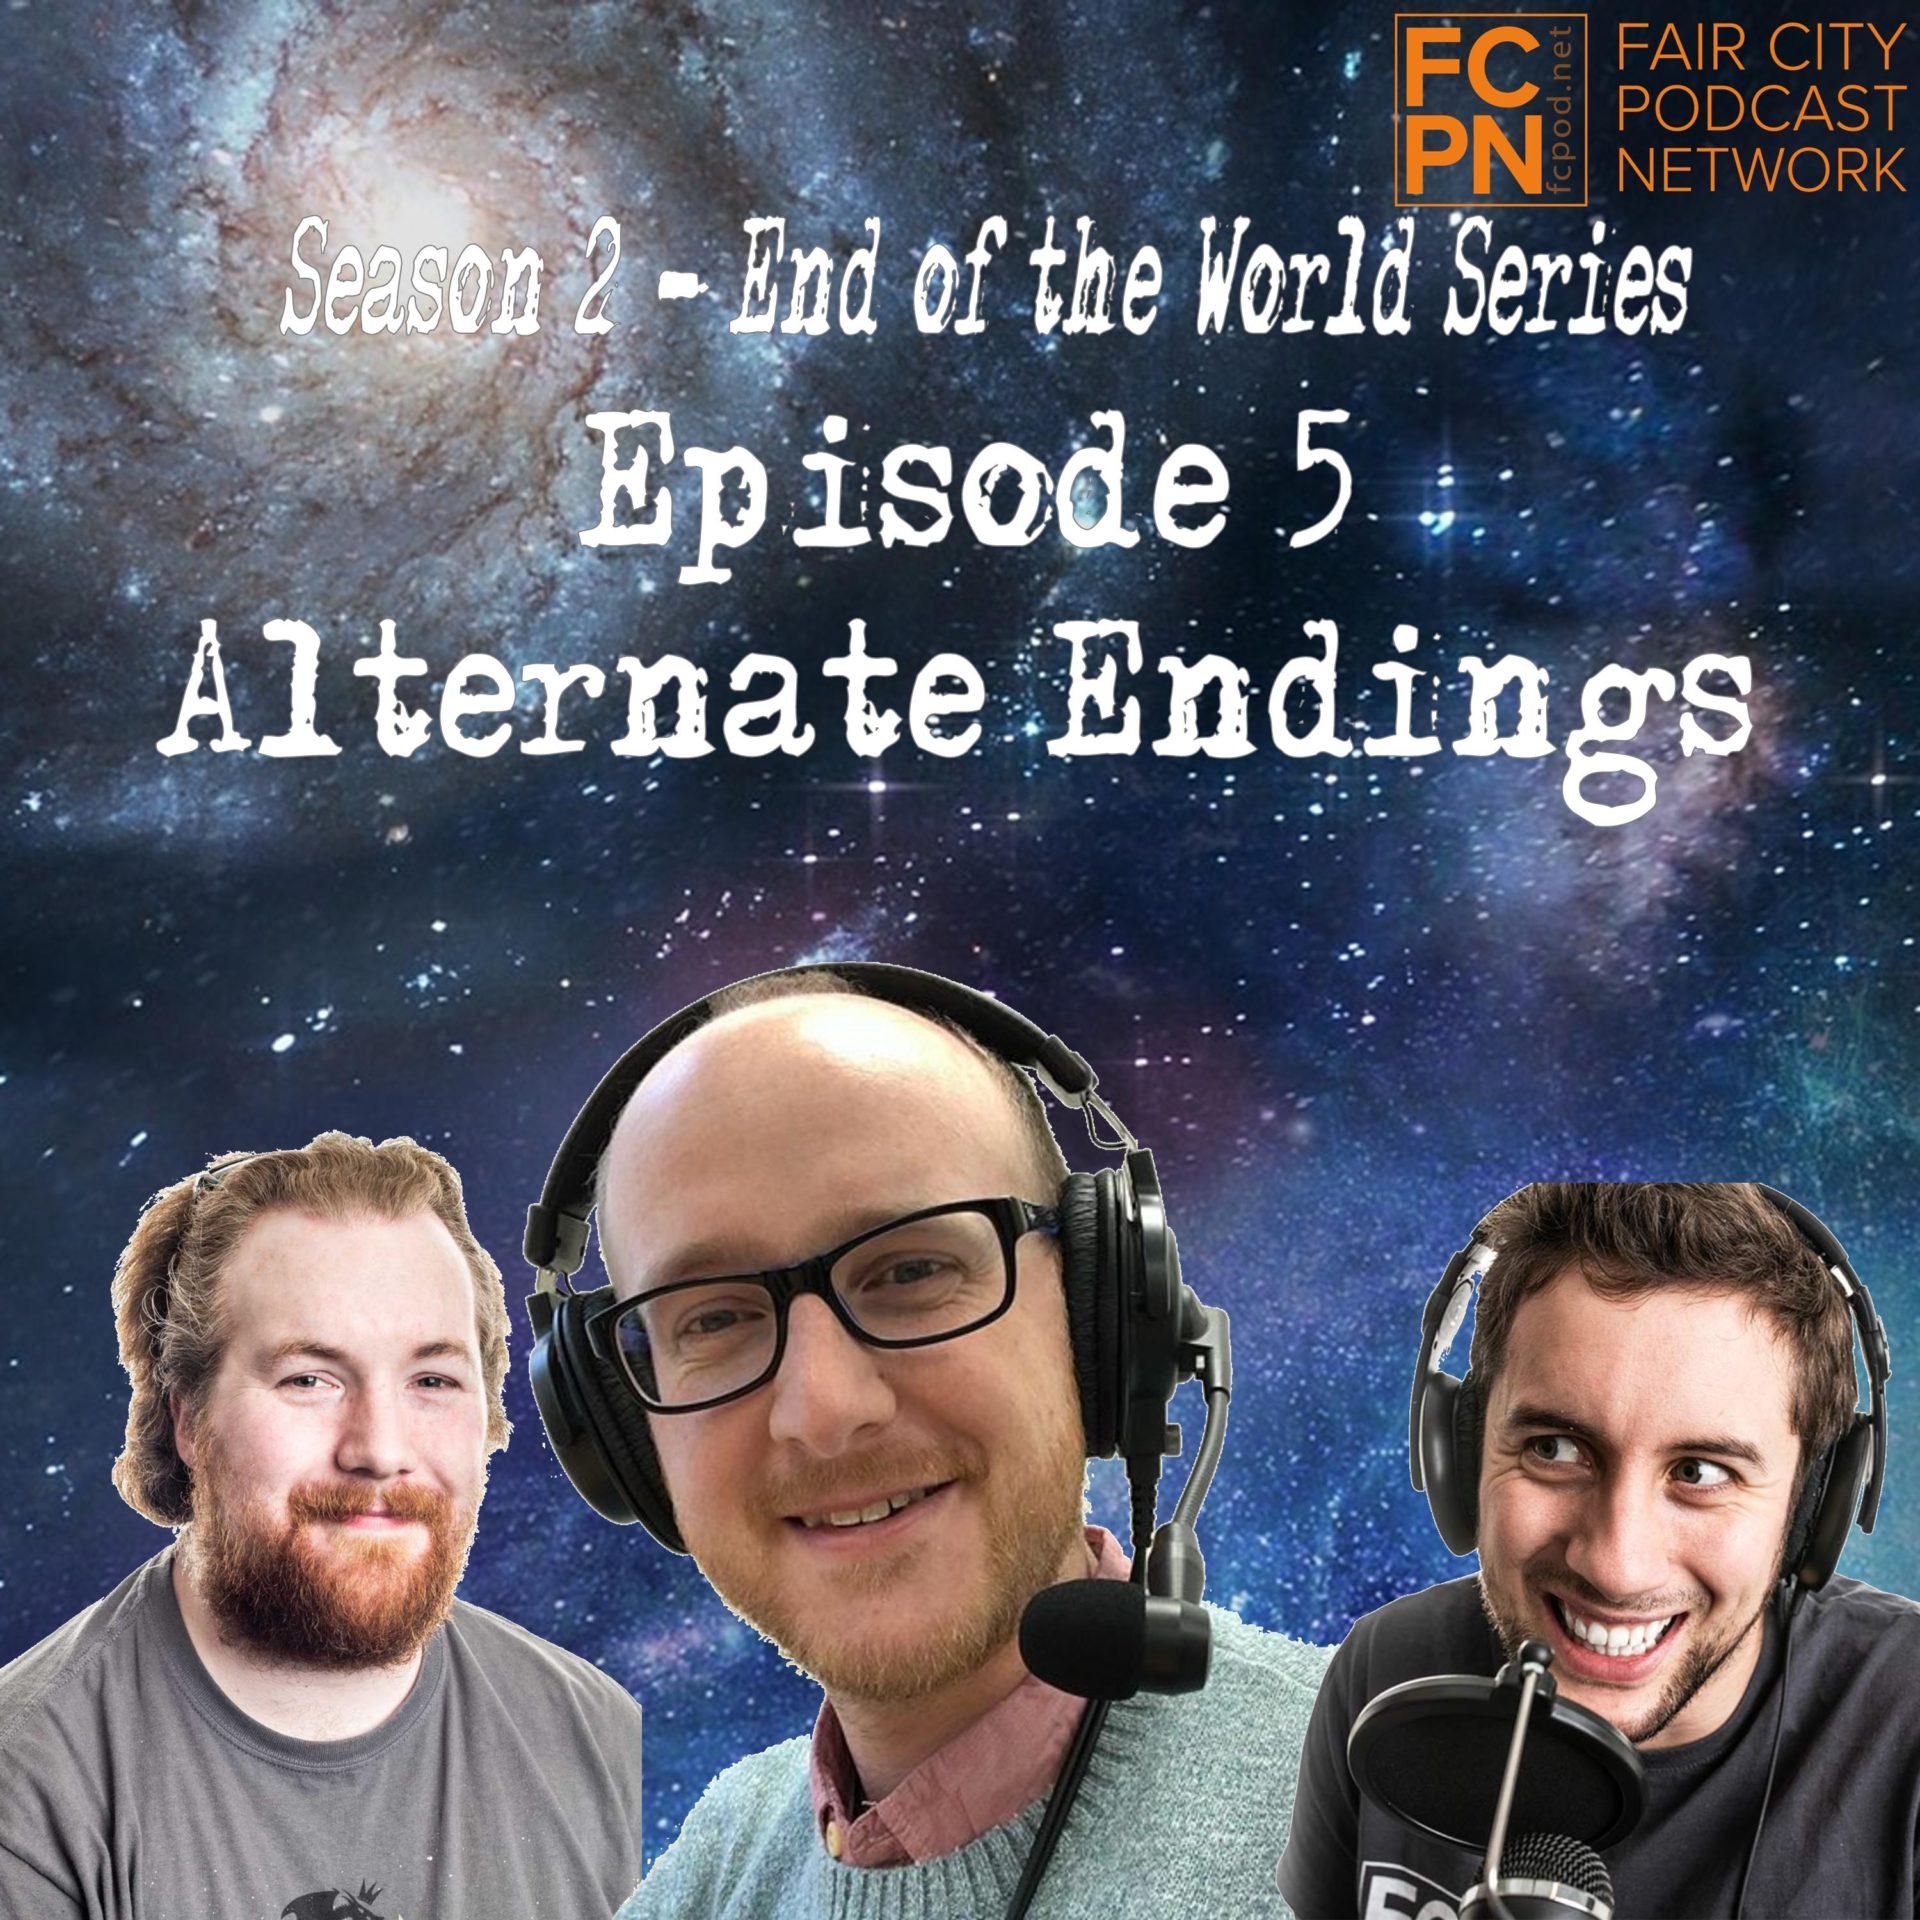 Season 2 Episode 5 – Alternate Endings